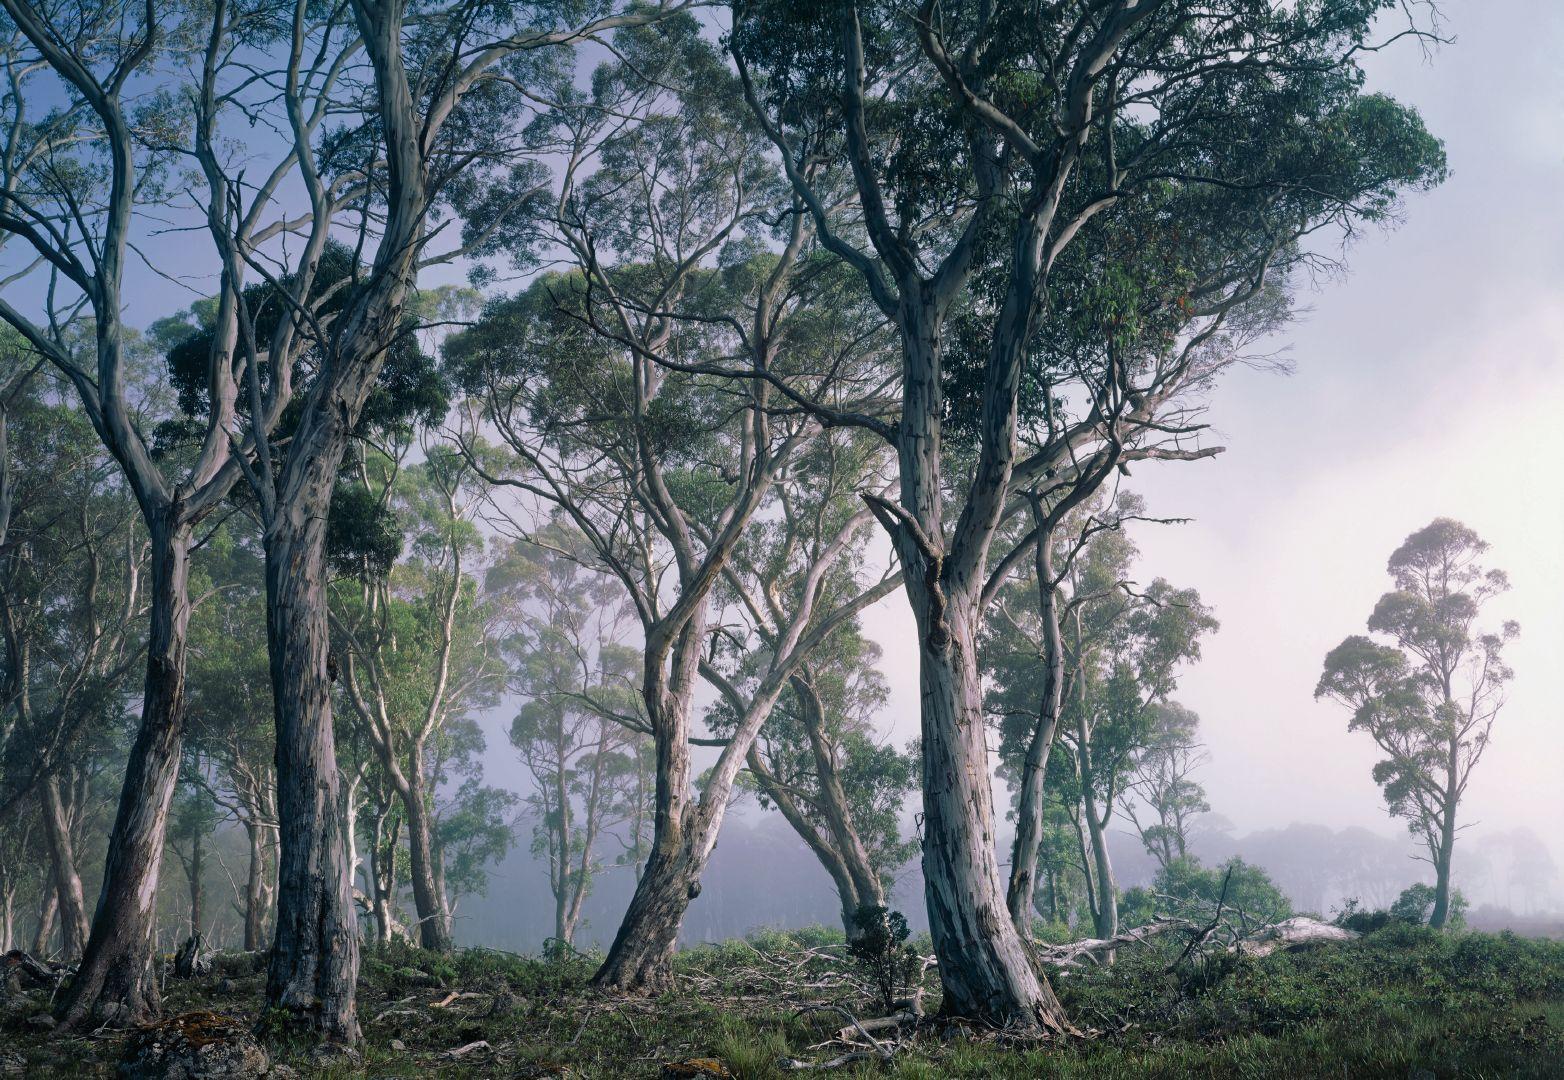 Fototapeta Fantasy Forest 8-523 (8-dílná fototapeta)